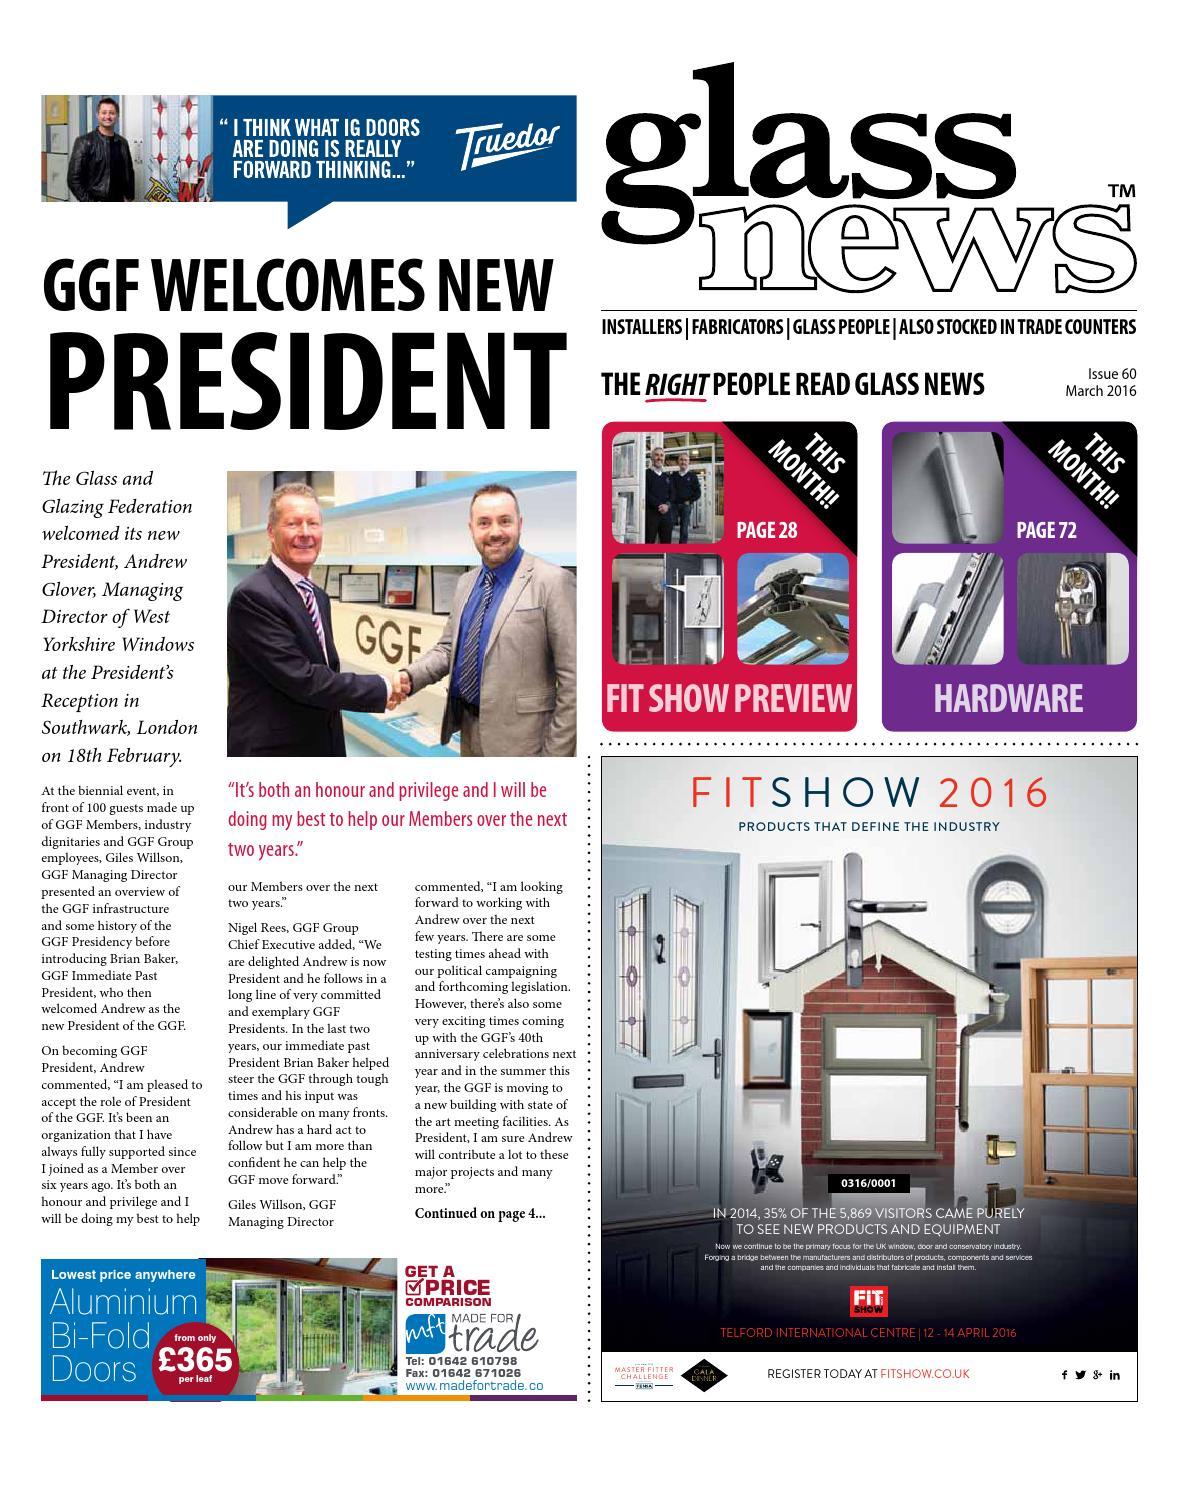 Glass News March 2016 by Christina Shaw - issuu